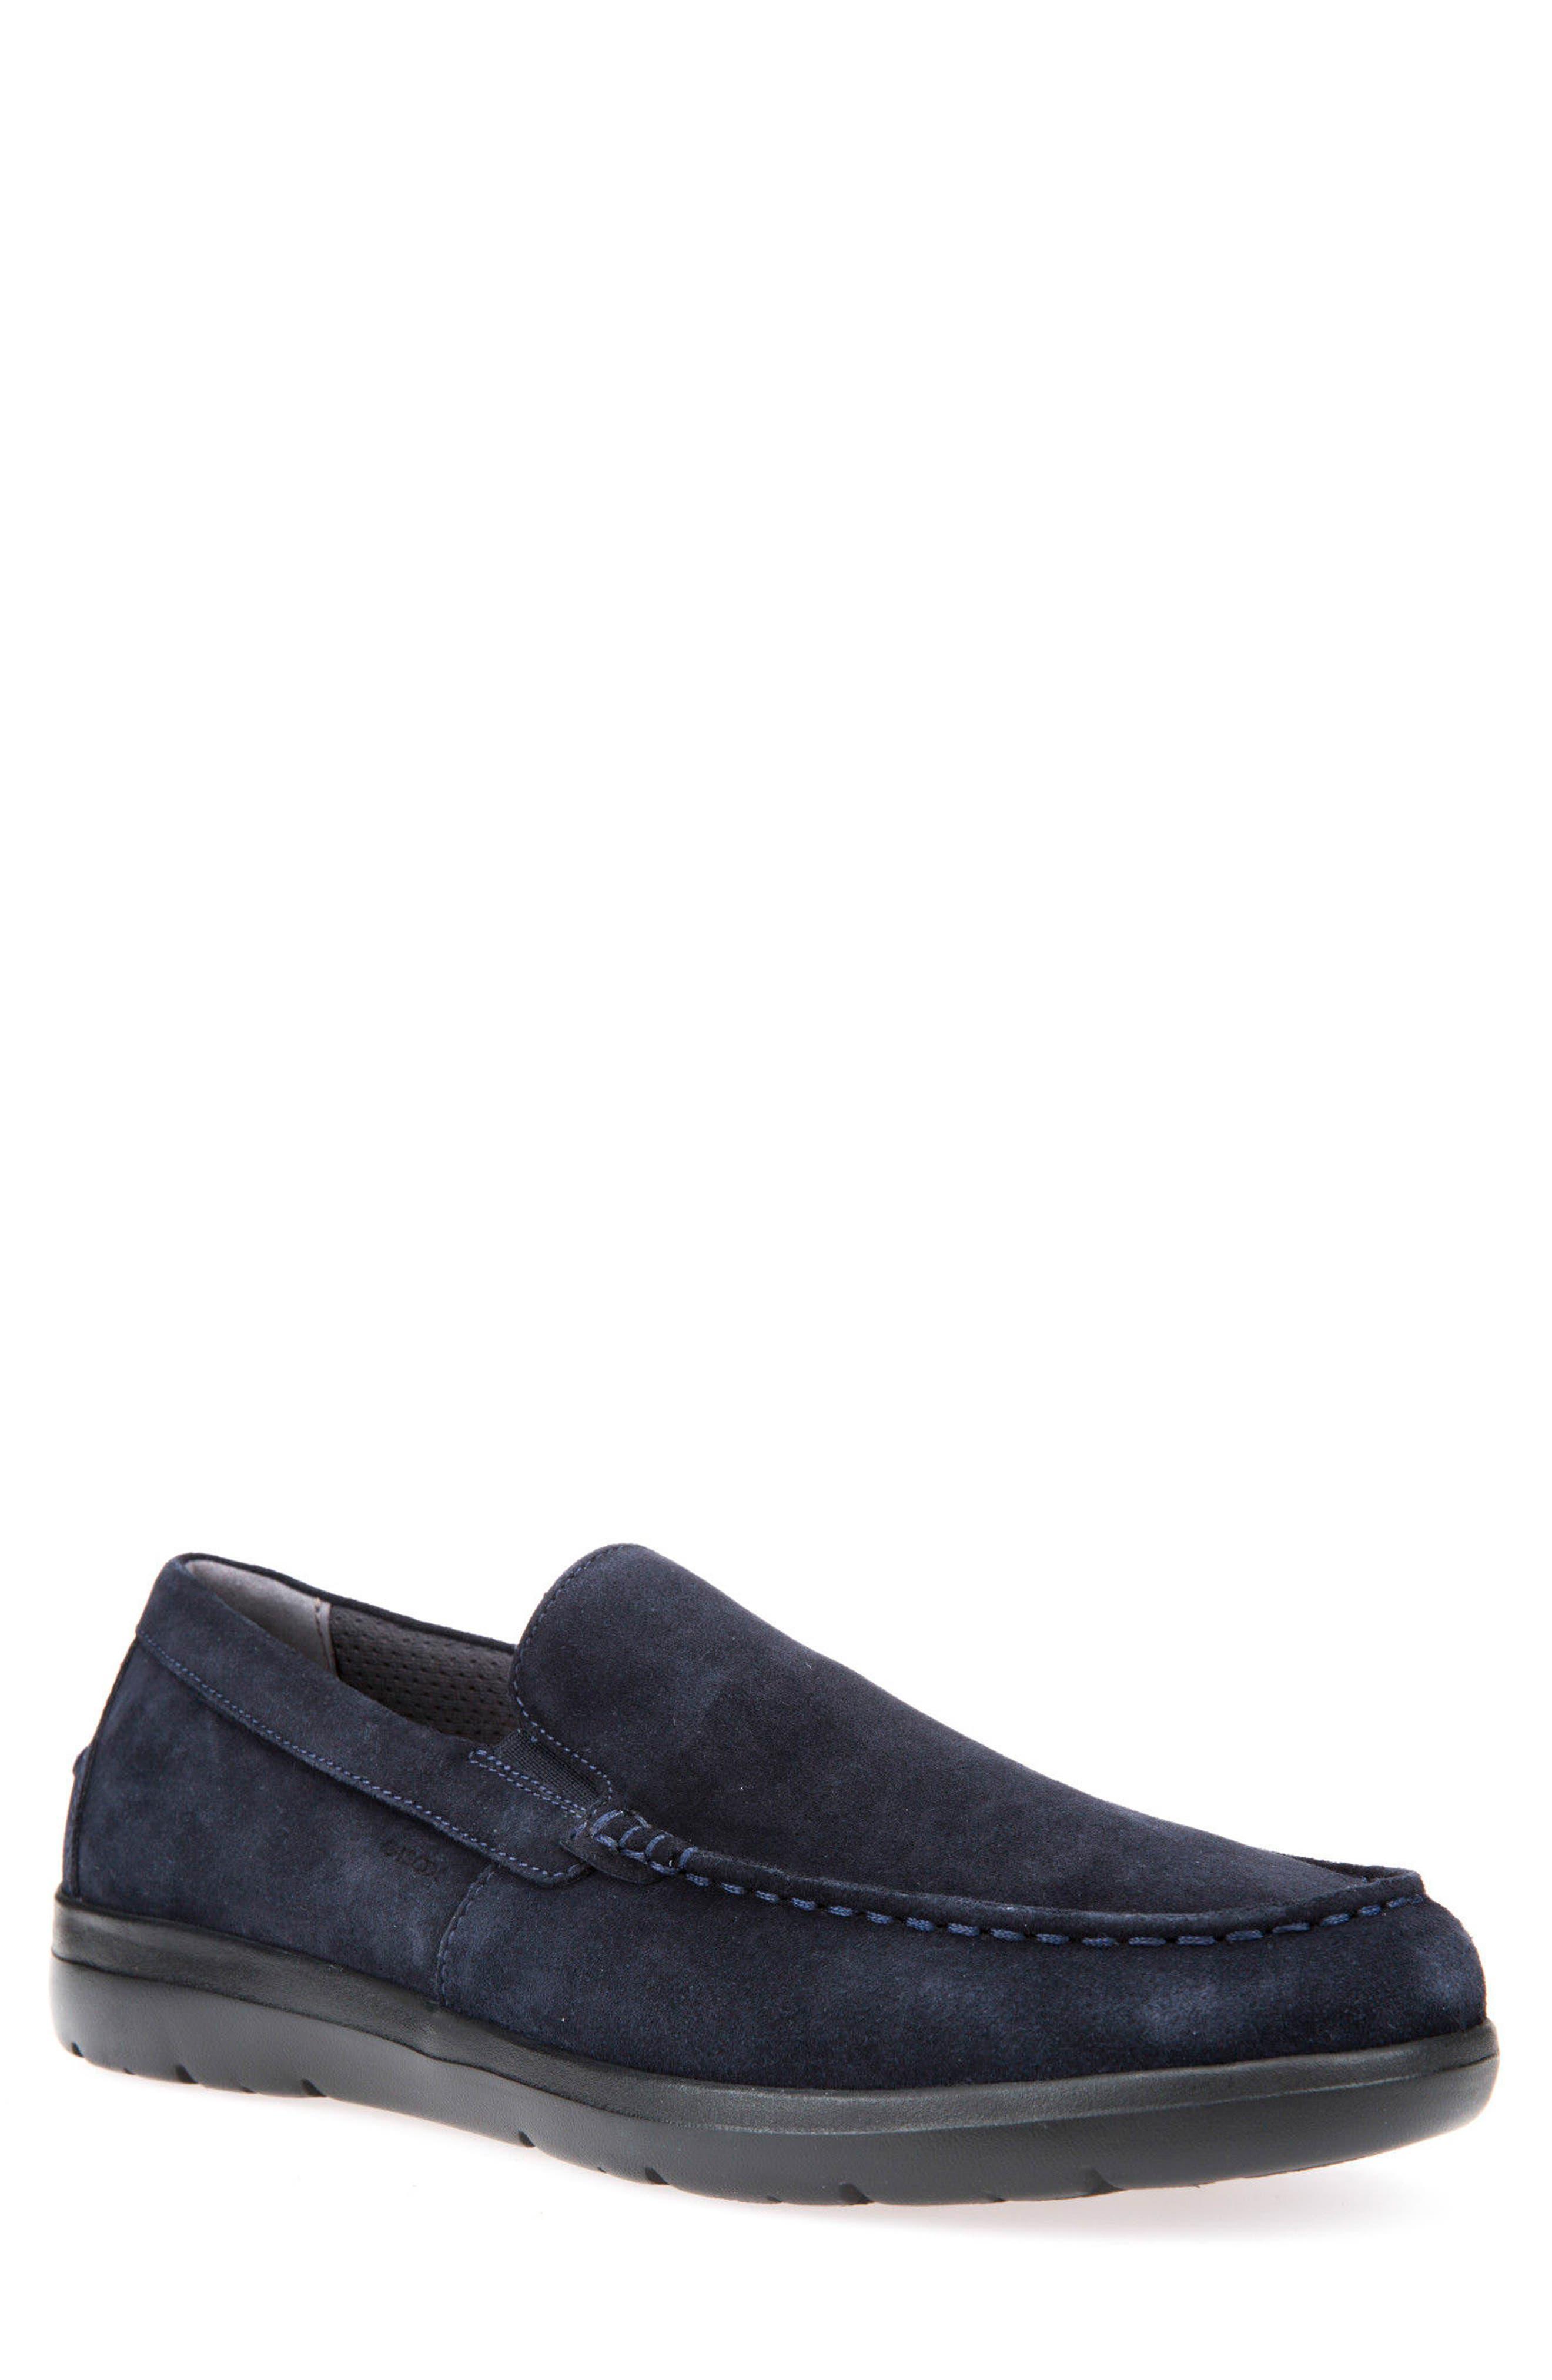 Leitan 2 Loafer,                         Main,                         color, NAVY